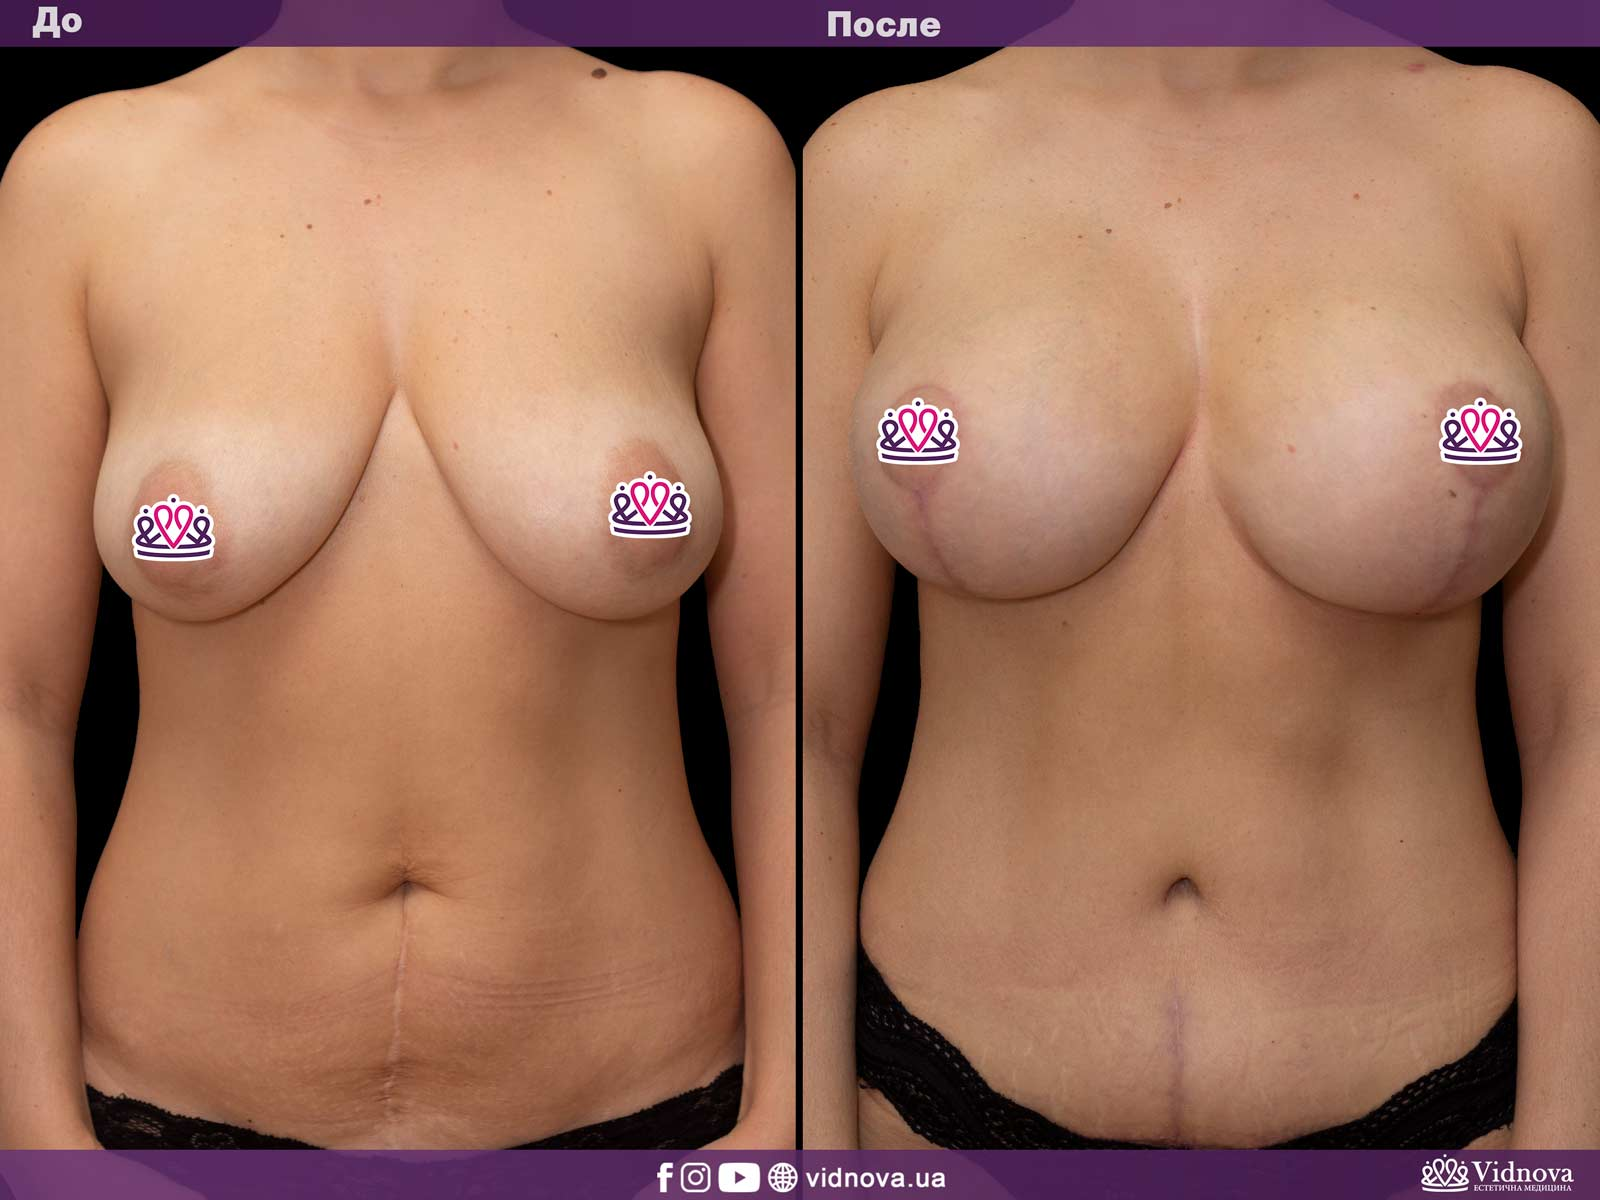 Подтяжка груди: Фото ДО и ПОСЛЕ - Пример №10-2 - Клиника Vidnova